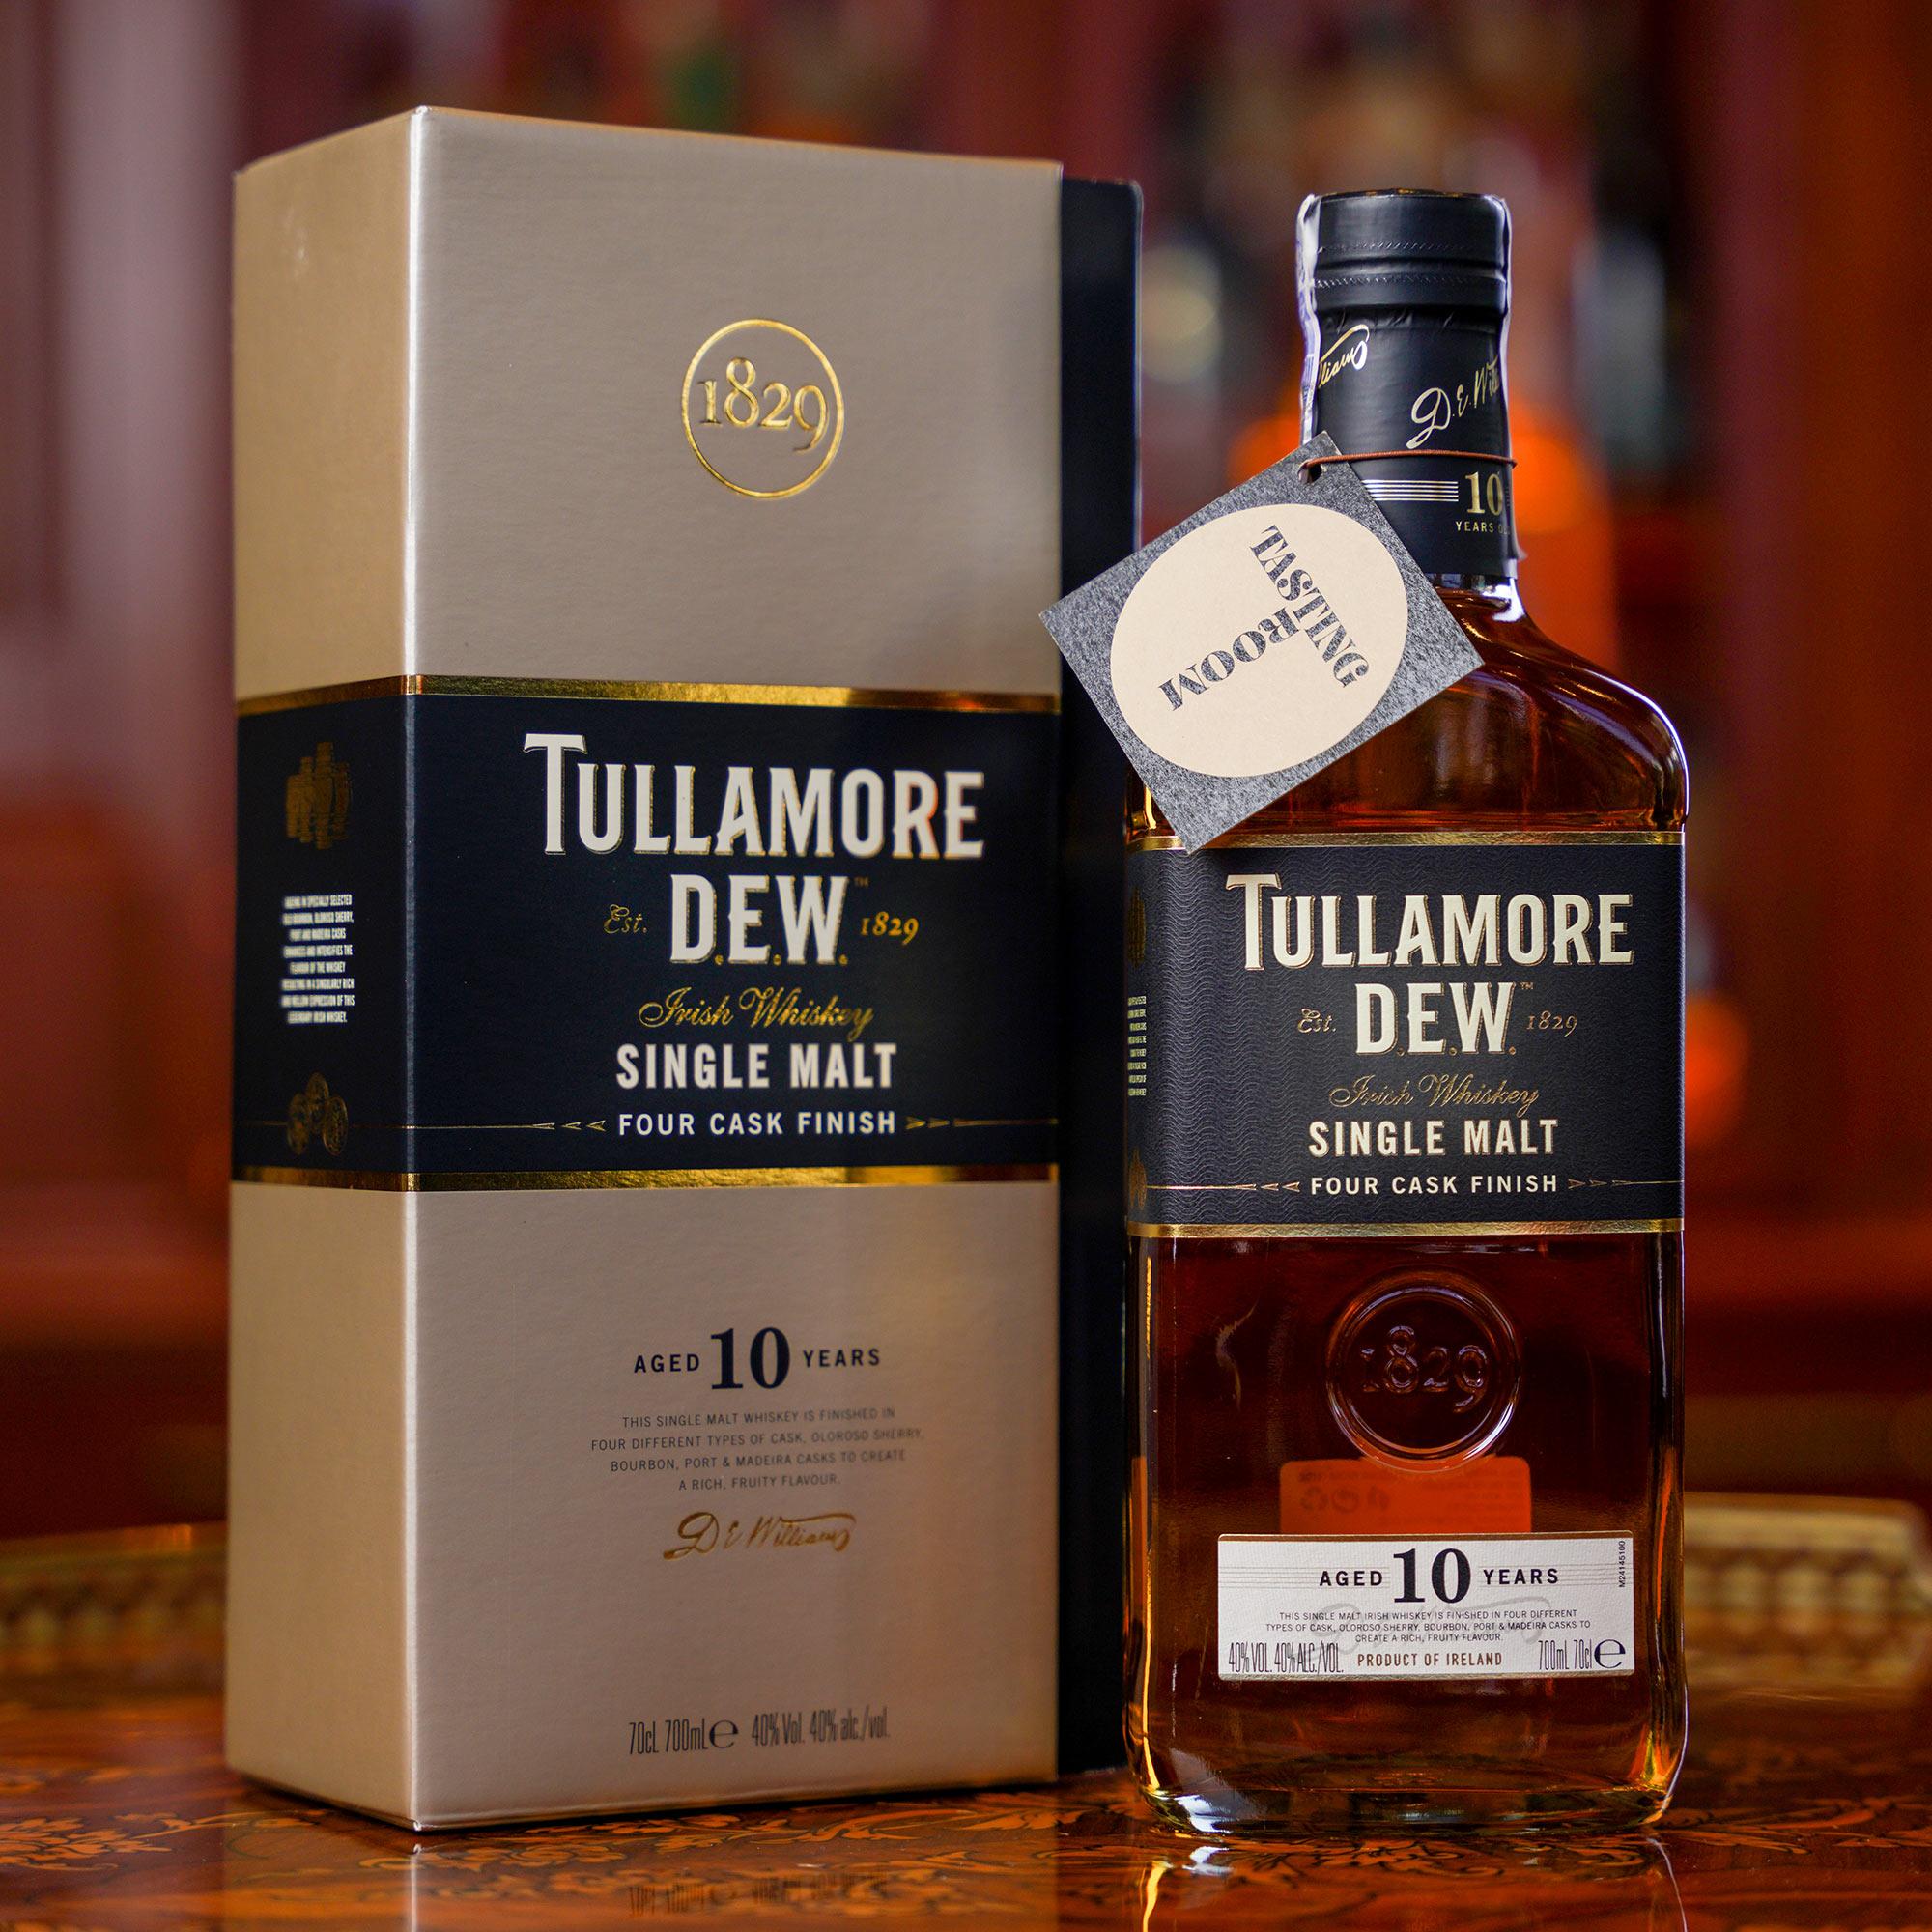 Tullamore DEW. 10 YO Single Malt /Тюламор Дю 10 годишен сингъл малц